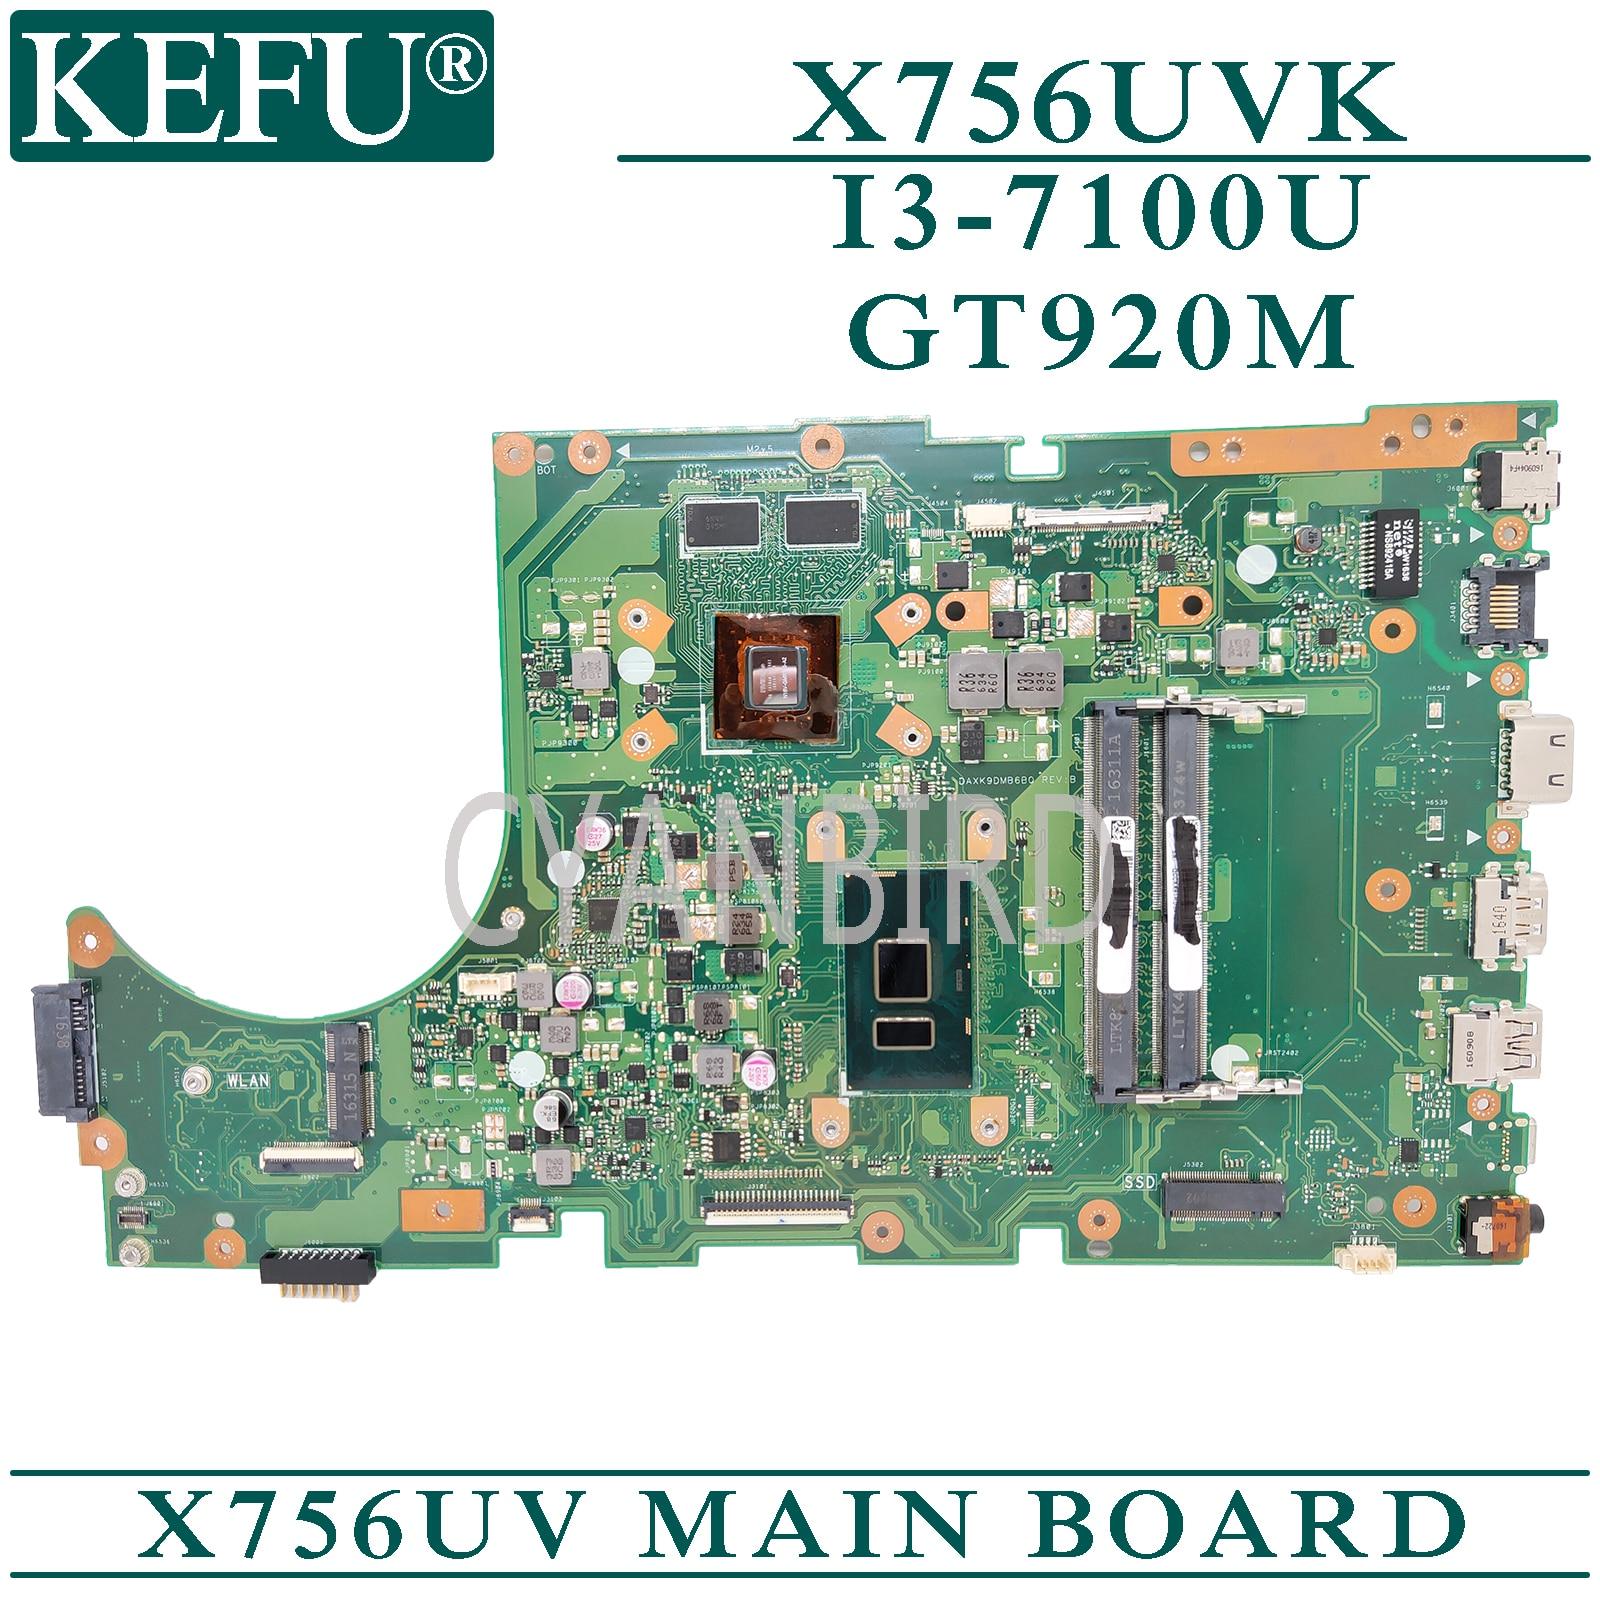 KEFU X756UV اللوحة الرئيسية الأصلية ل ASUS X756UVK X756UAK X756UAM X756UA مع I3-7100U GT920M اللوحة الأم للكمبيوتر المحمول